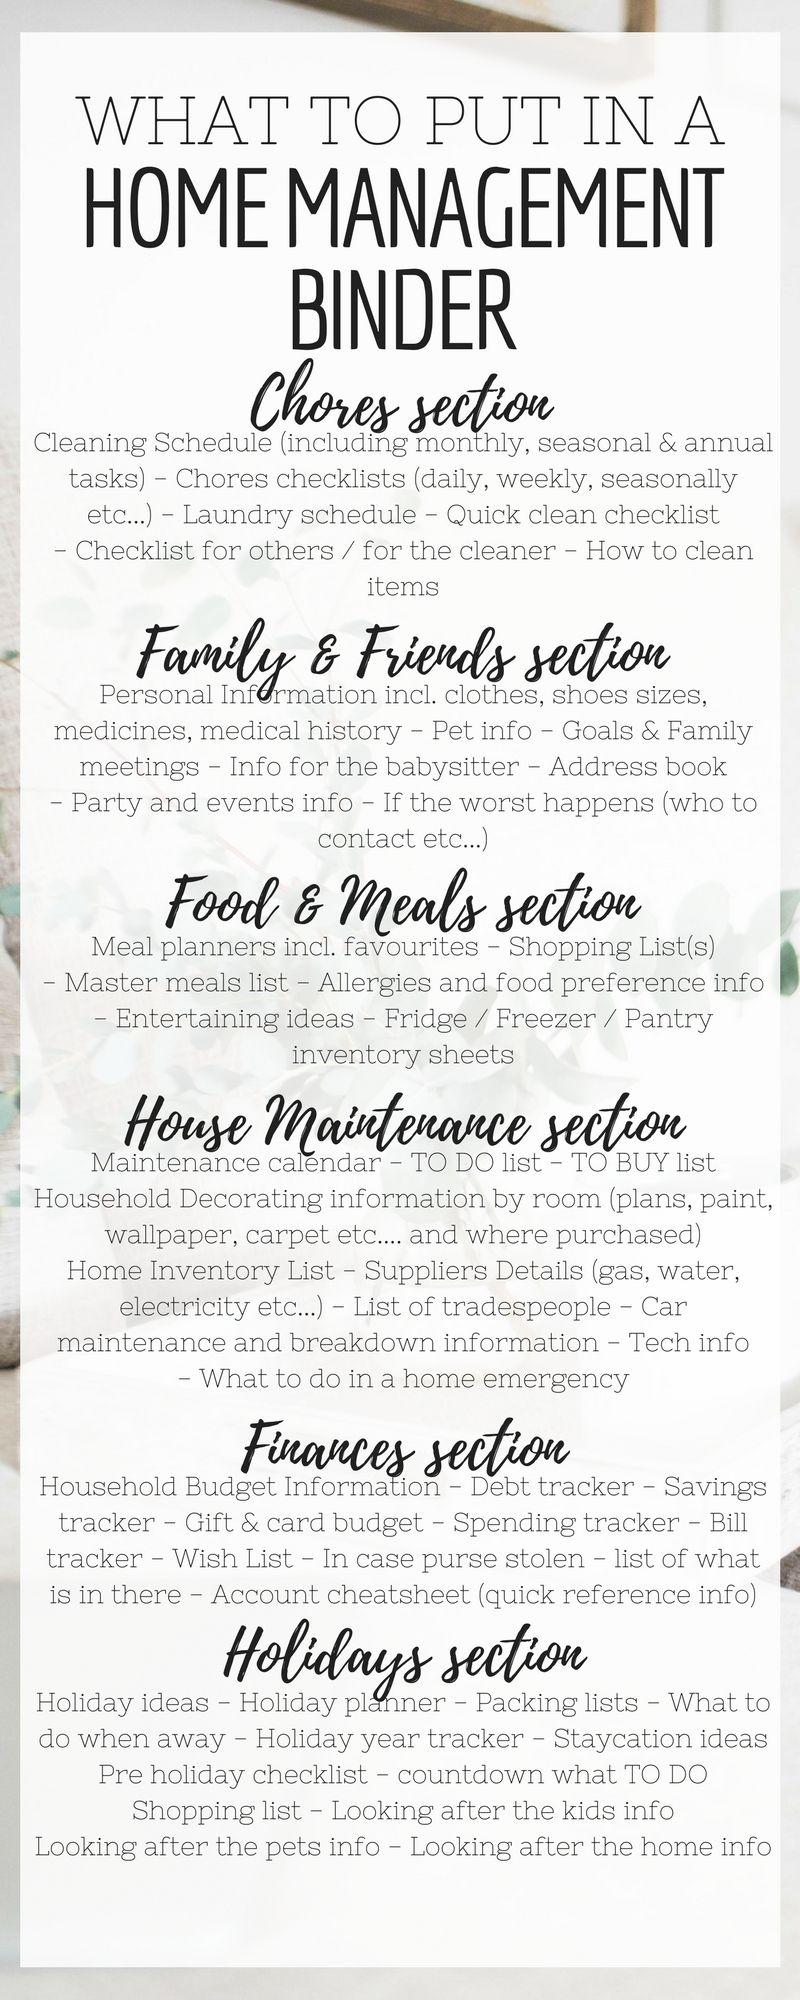 Home Management Binder Contents List